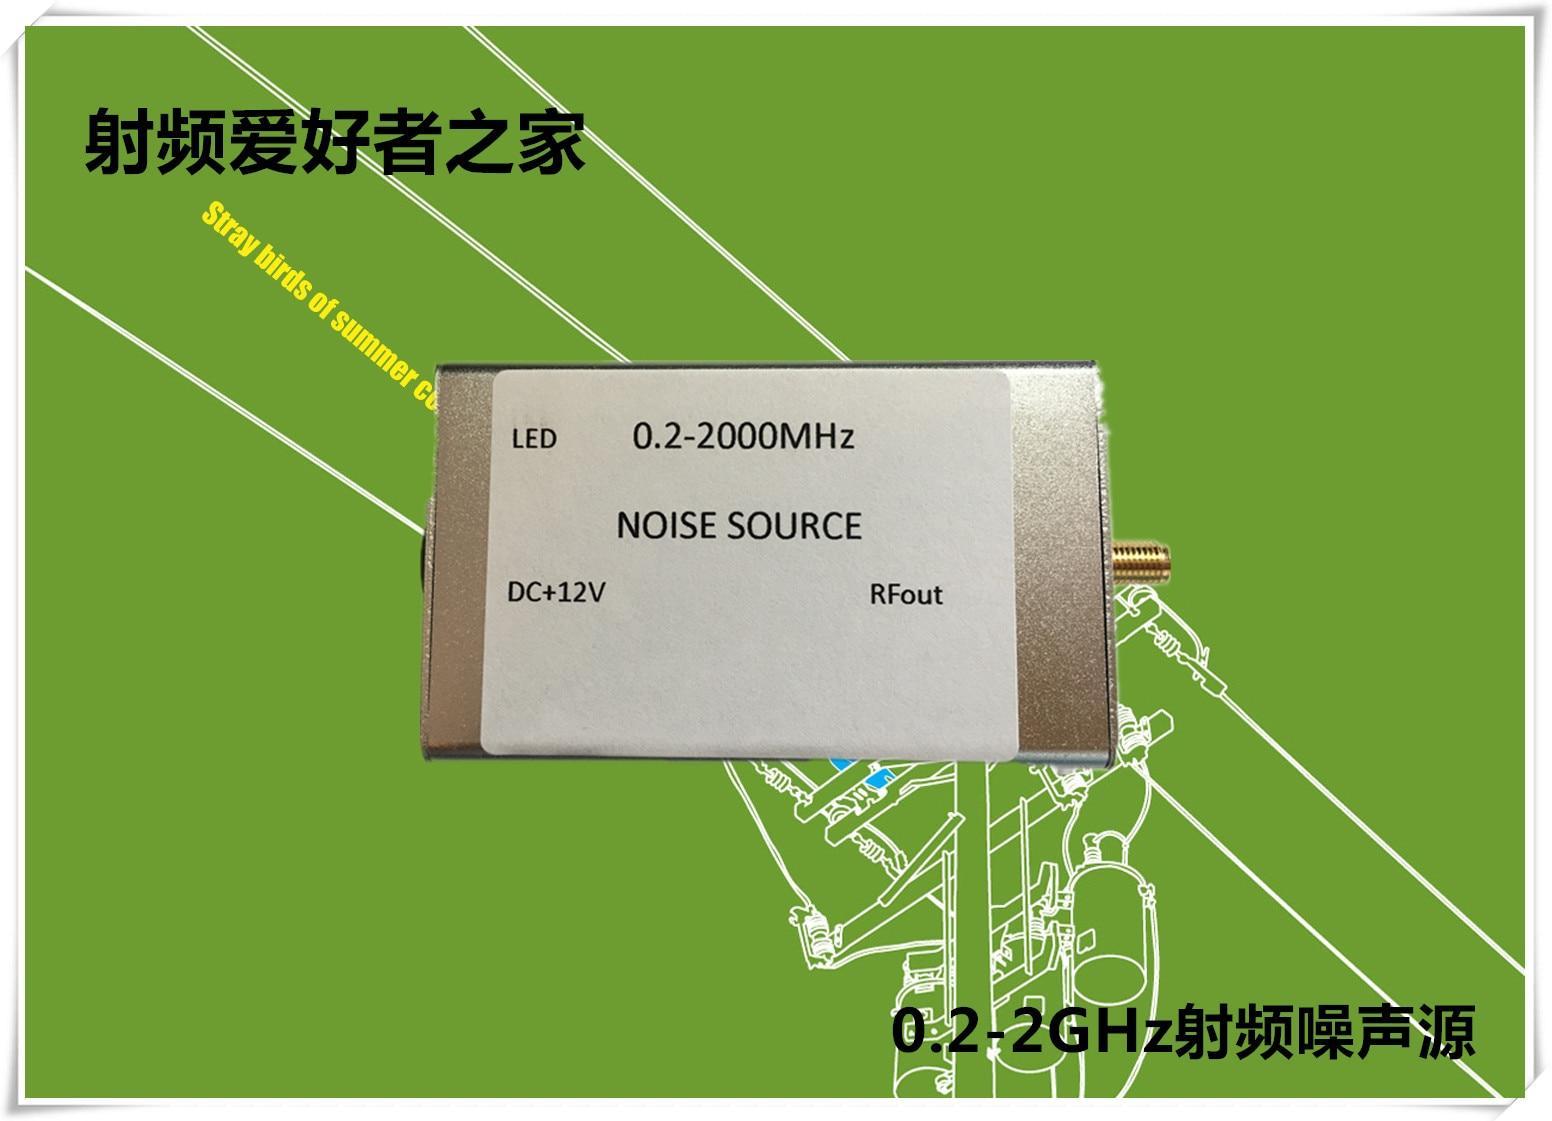 Noise Signal Generator Noise Source Spectrum Tracking Signal Source 0.2-2000M Flatness High цена 2017